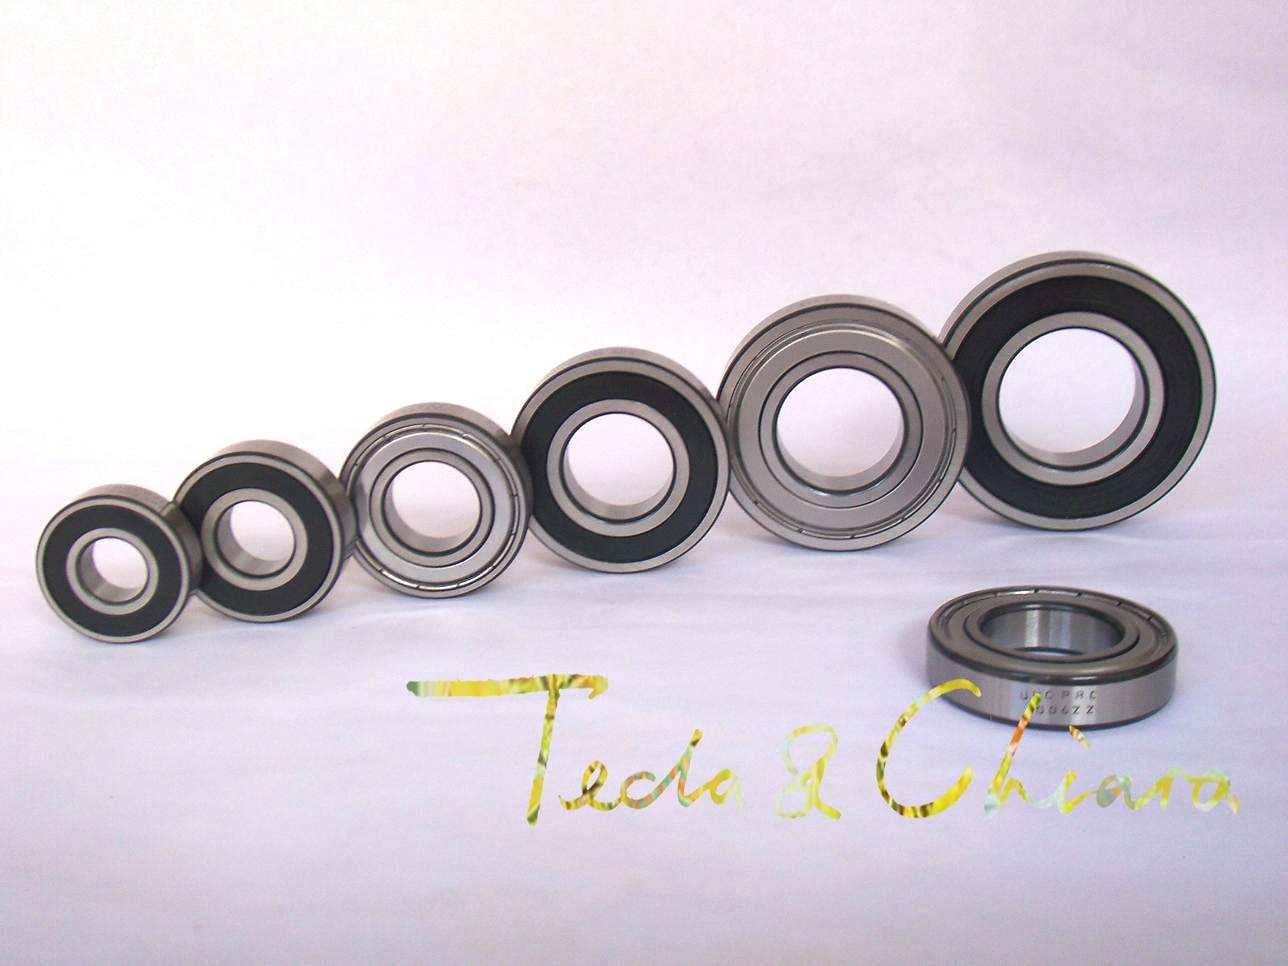 6901 6901ZZ 6901RS 6901-2Z 6901Z 6901-2RS ZZ RS RZ 2RZ Deep Groove Ball Bearings 12 x 24 x 6mm High Quality hettich 6901 22